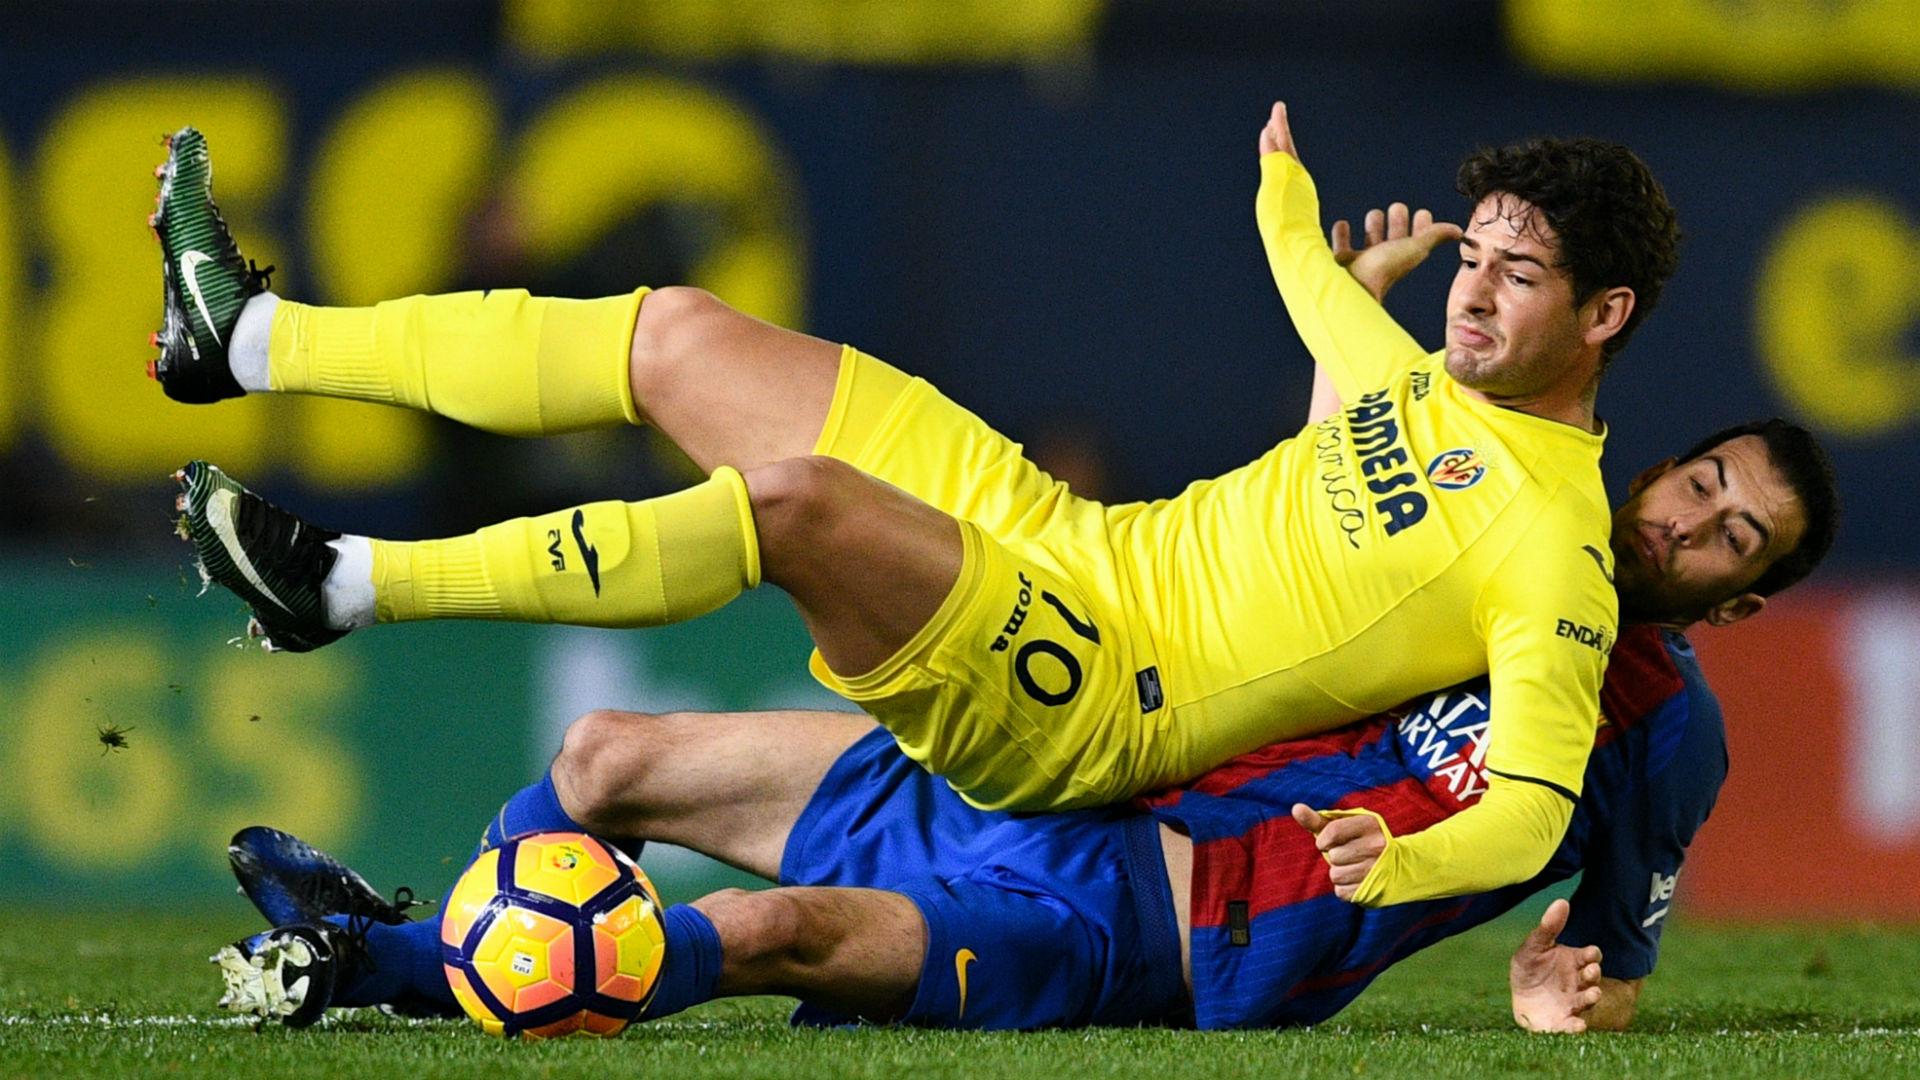 26 NOVEMBER 2018 FOOTBALL RESULTS : VILLARREAL vs REAL BETIS